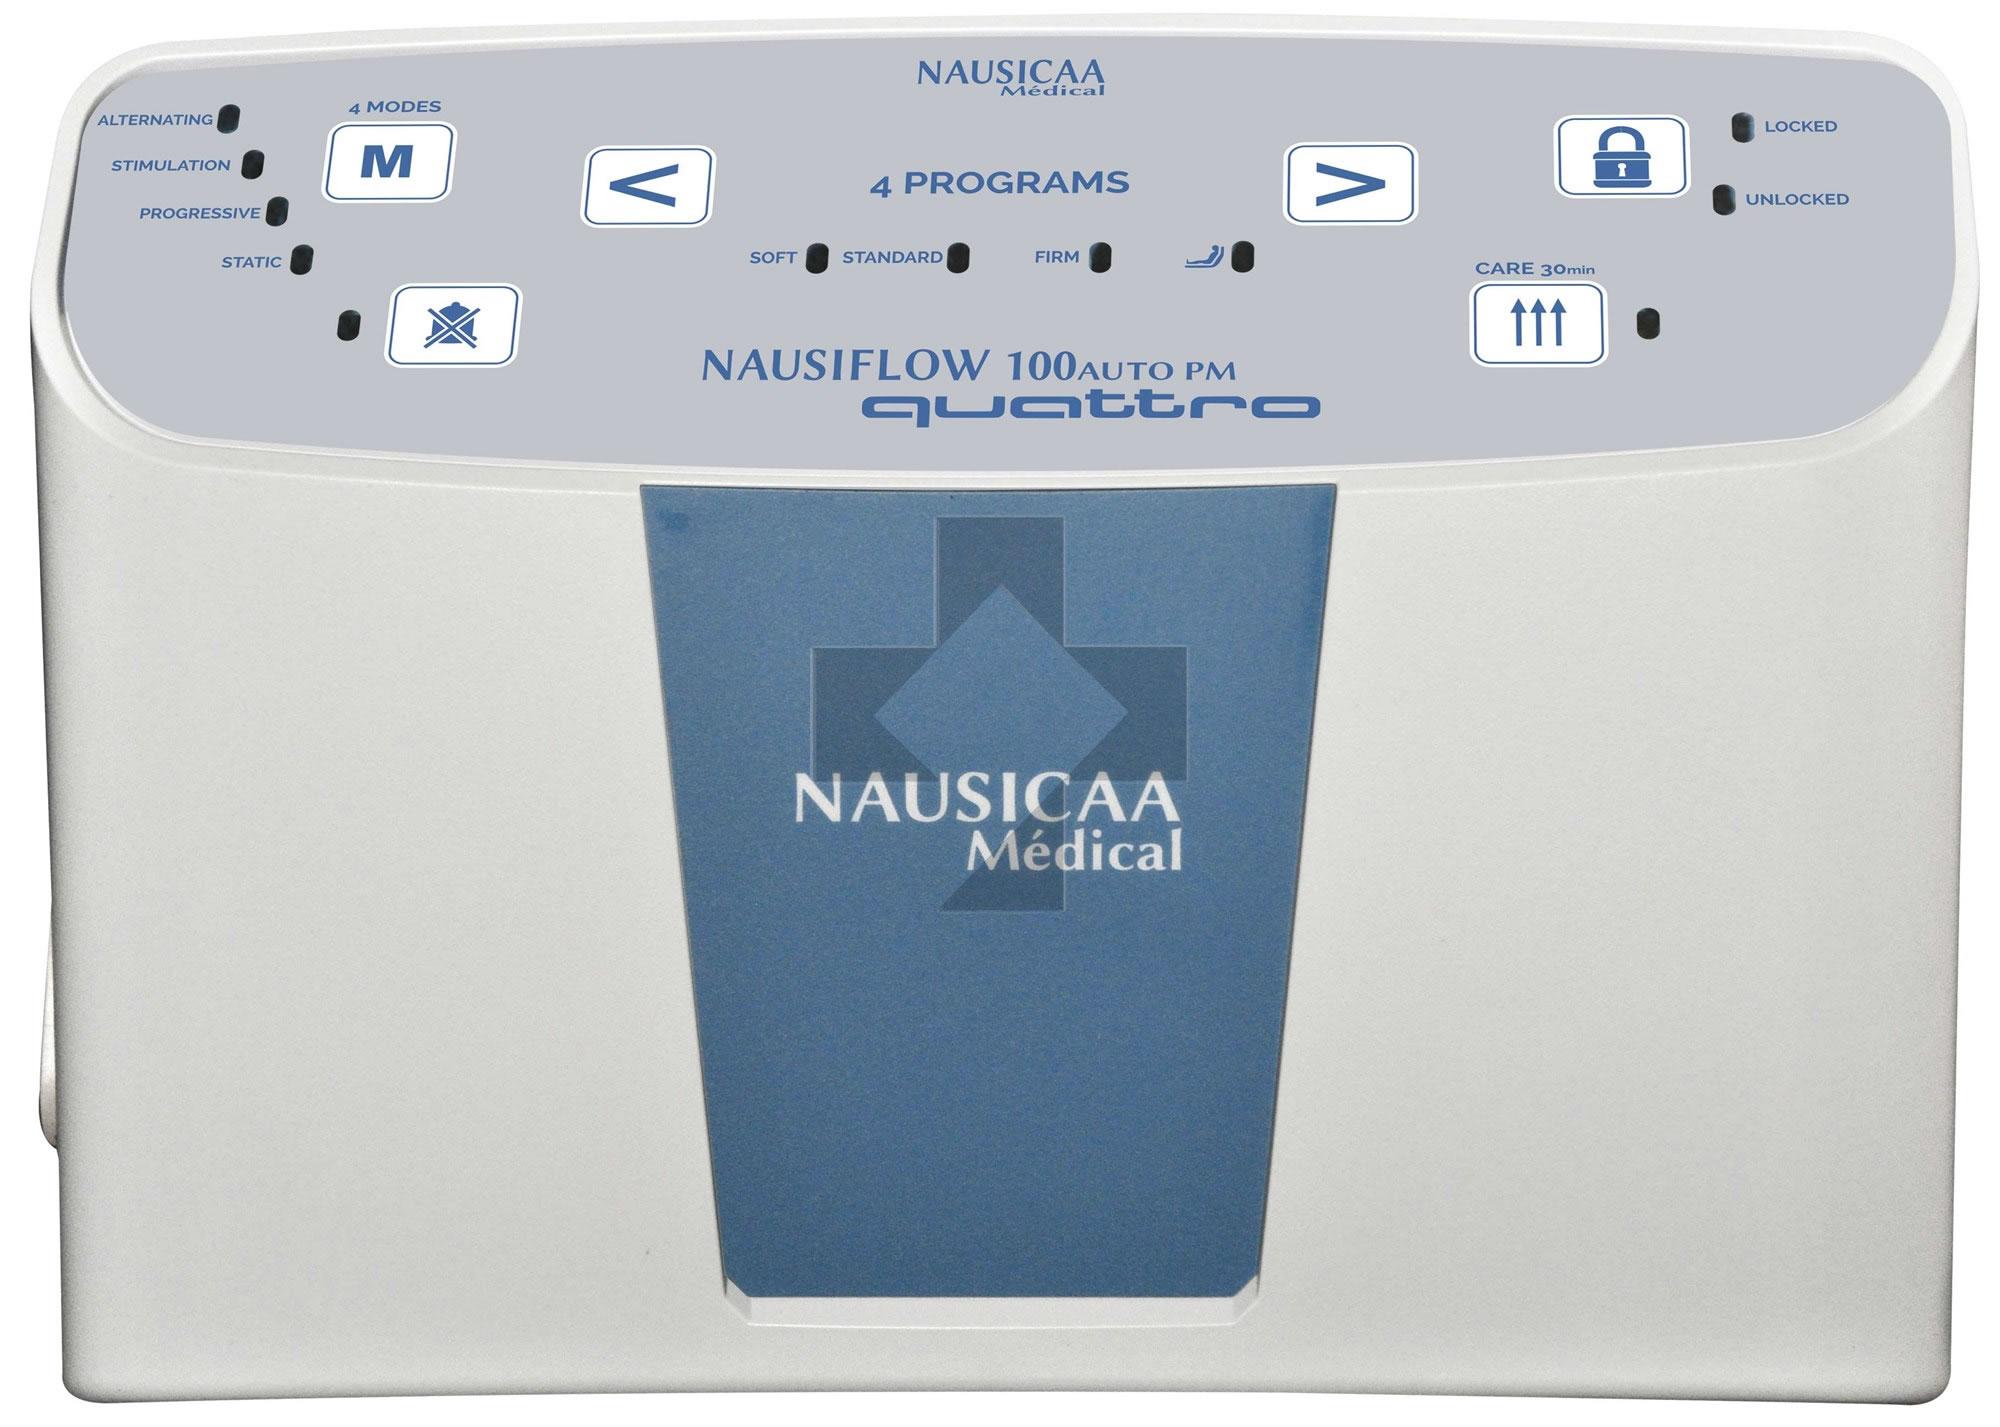 Materasso antidecubito 2-512 + compressore Nausiflow 100 Auto NA100QTO834-SYS Nausicaa Medical